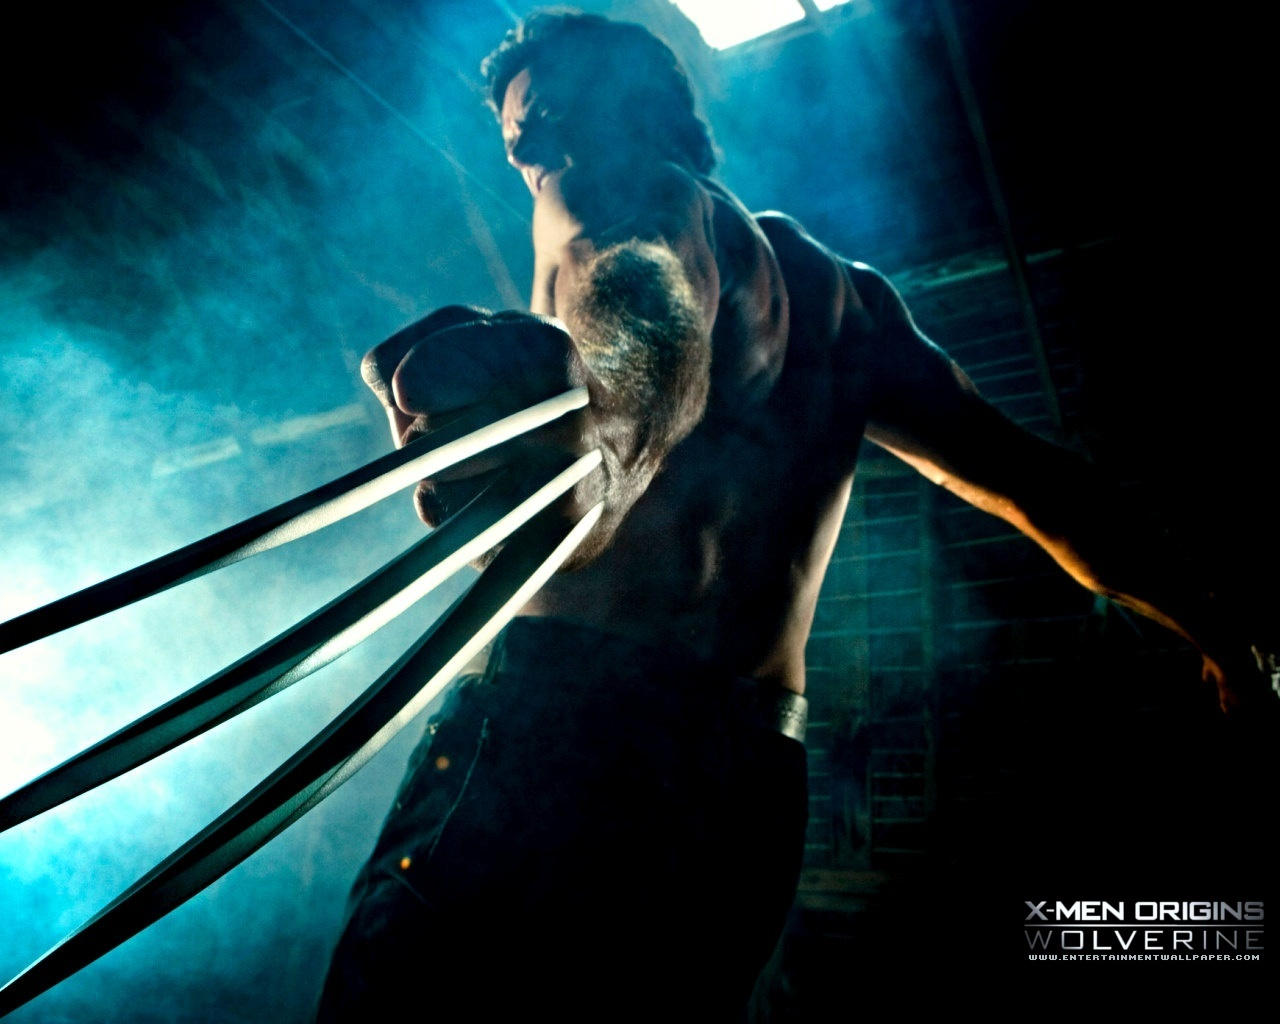 Men Origins Wolverine Wallpaper   Upcoming Movies Wallpaper 1280x1024